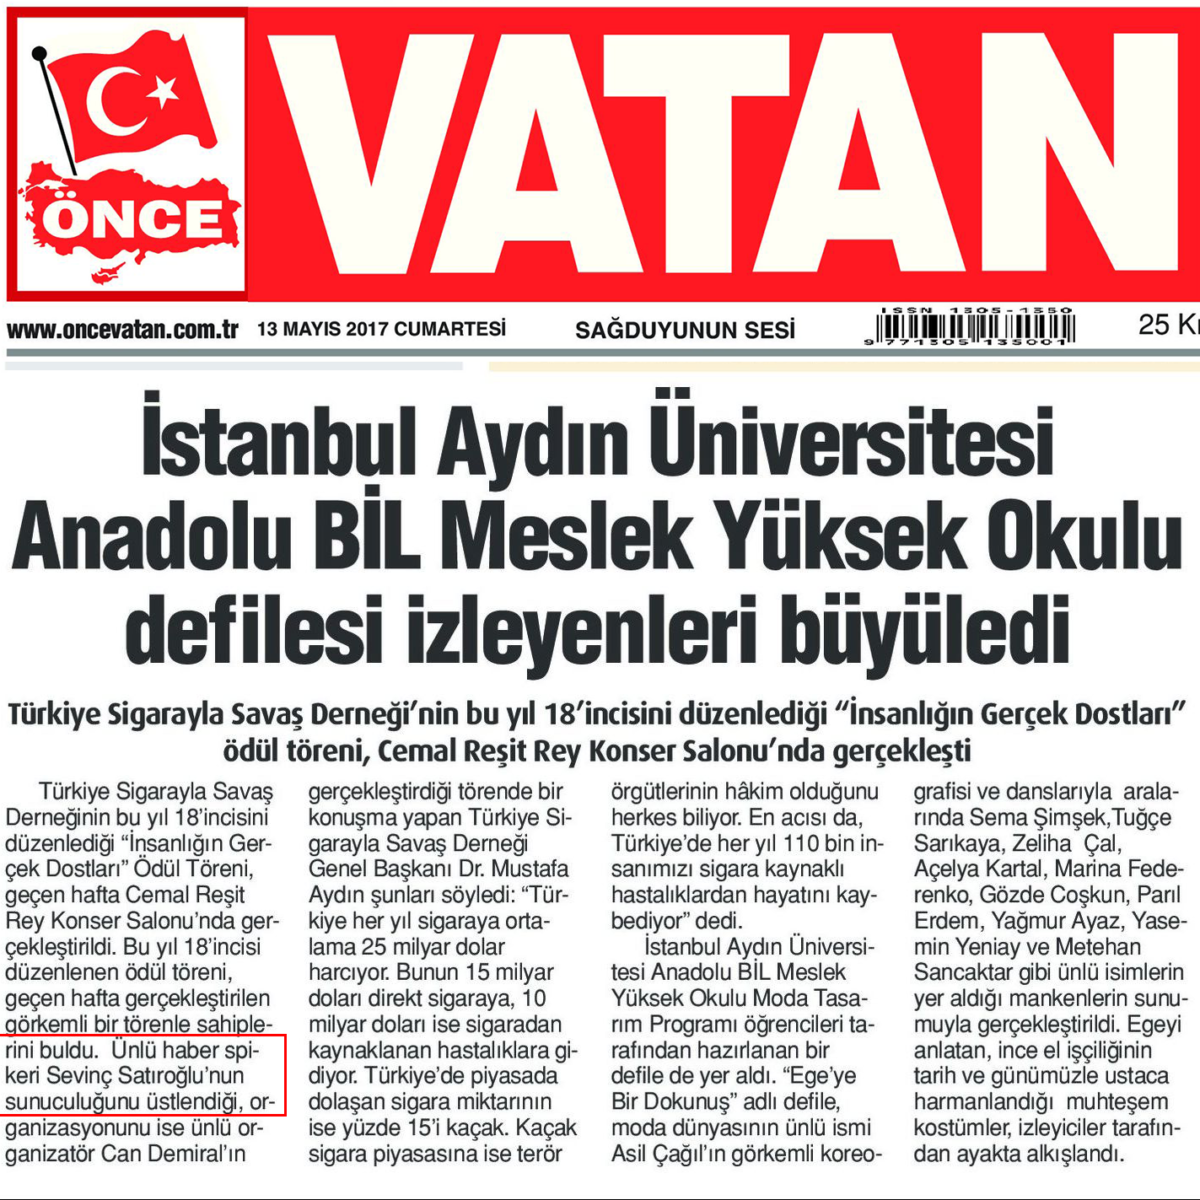 Sevinç Satıroğlu Sunucu Master of Ceremony 9